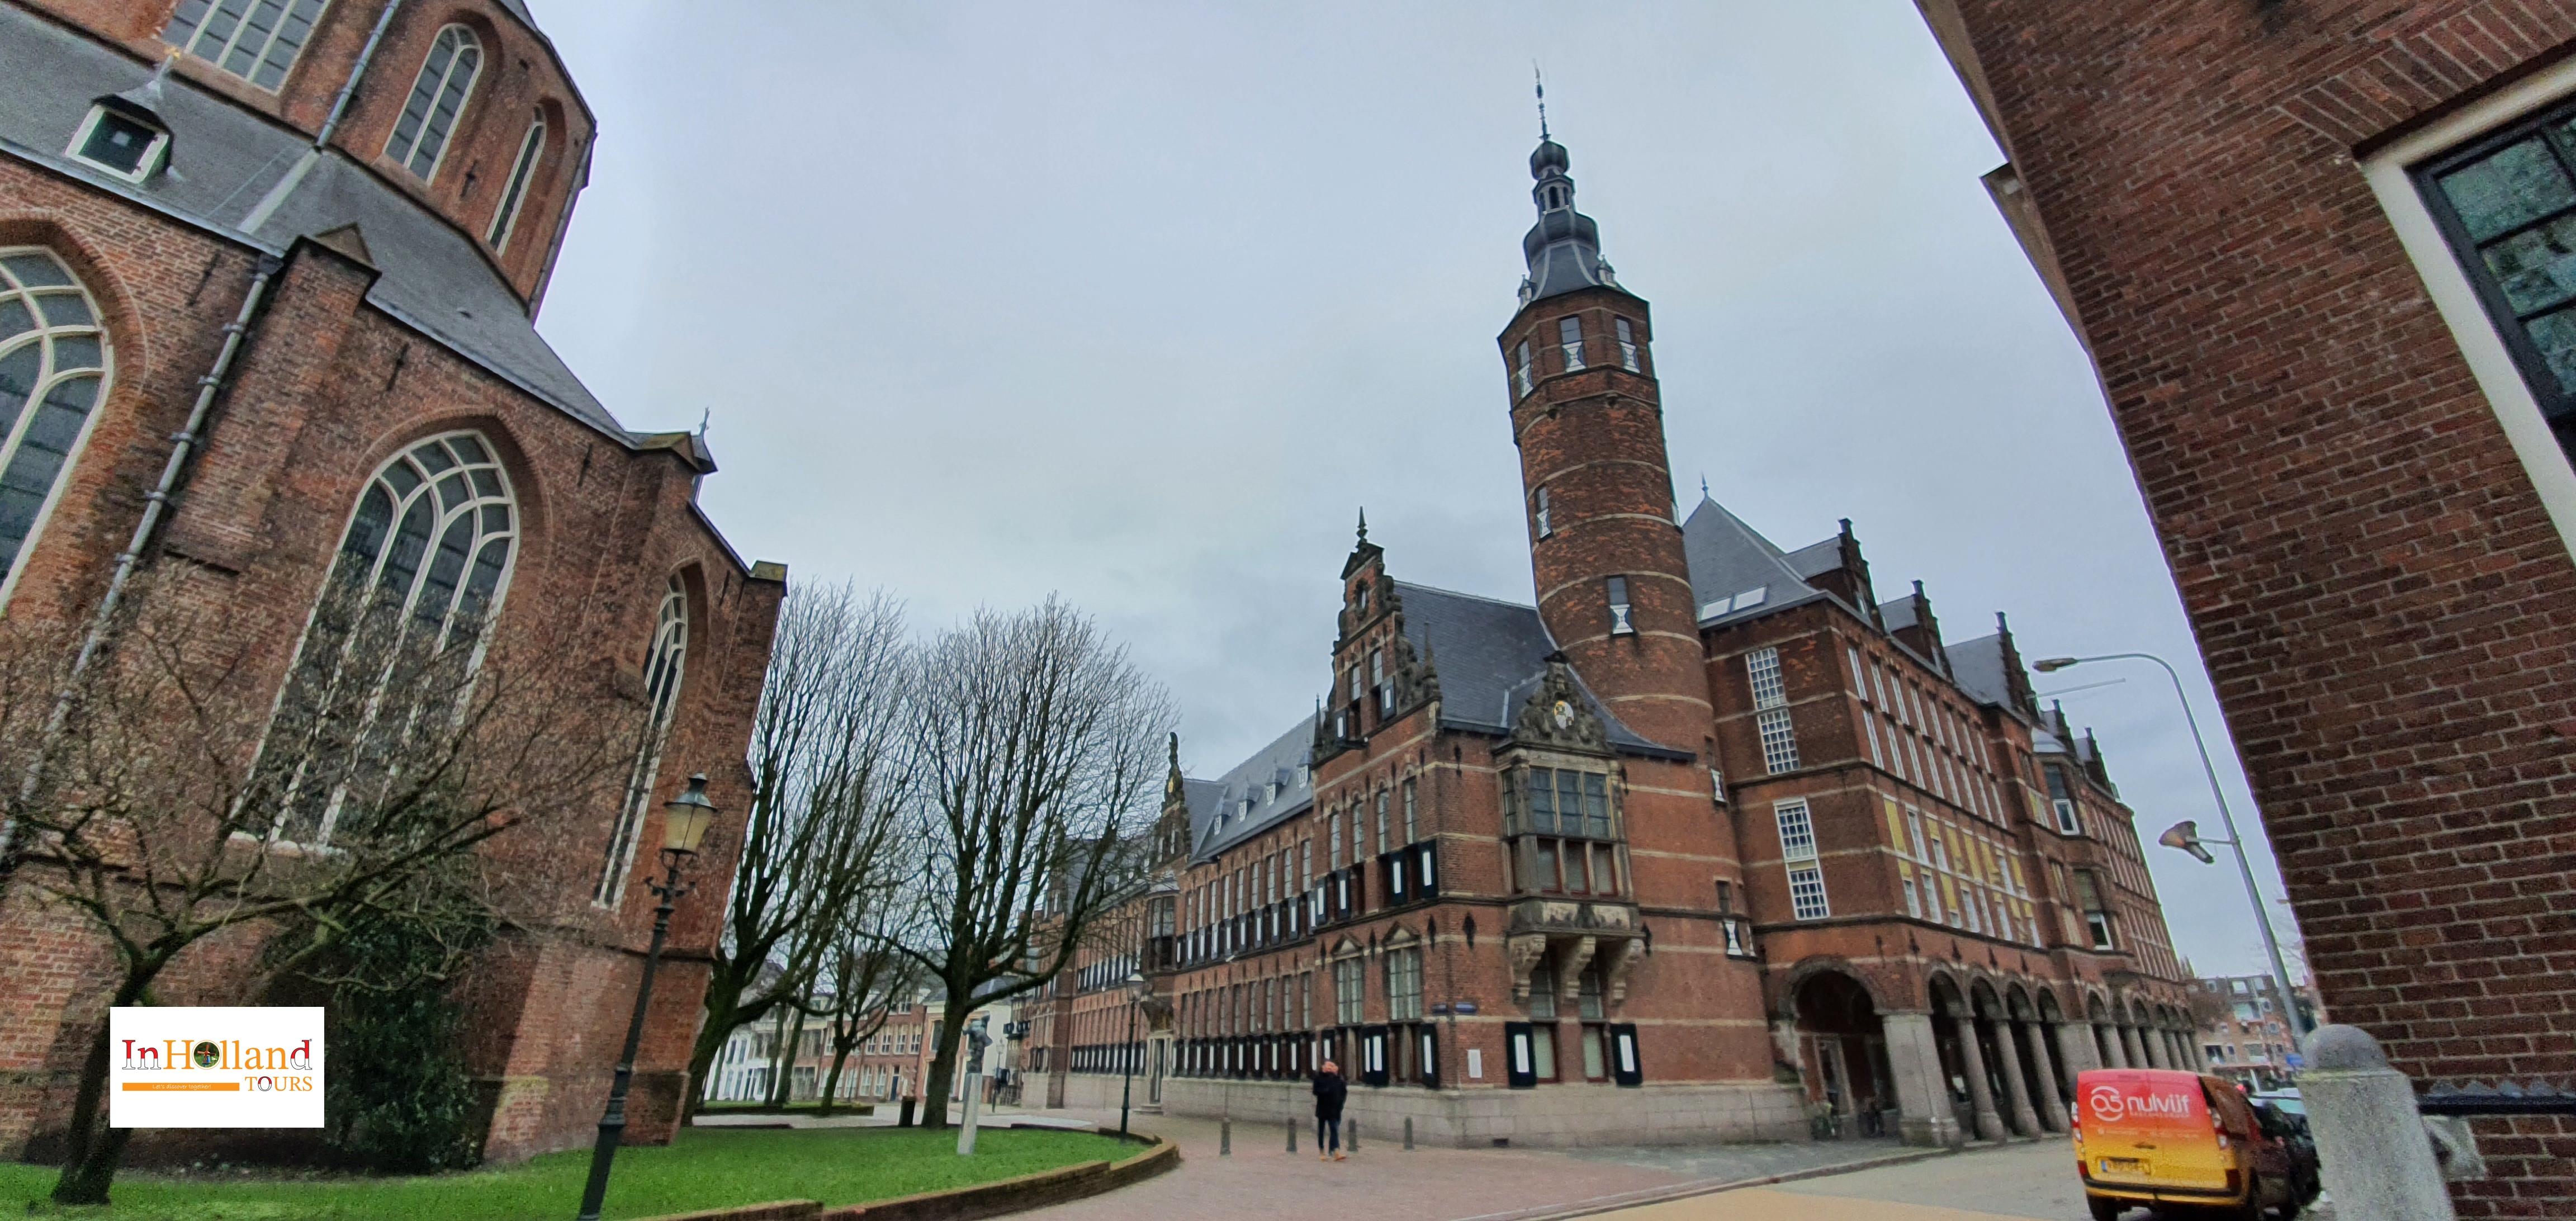 groningen28-belanda-indoholland-tourscom